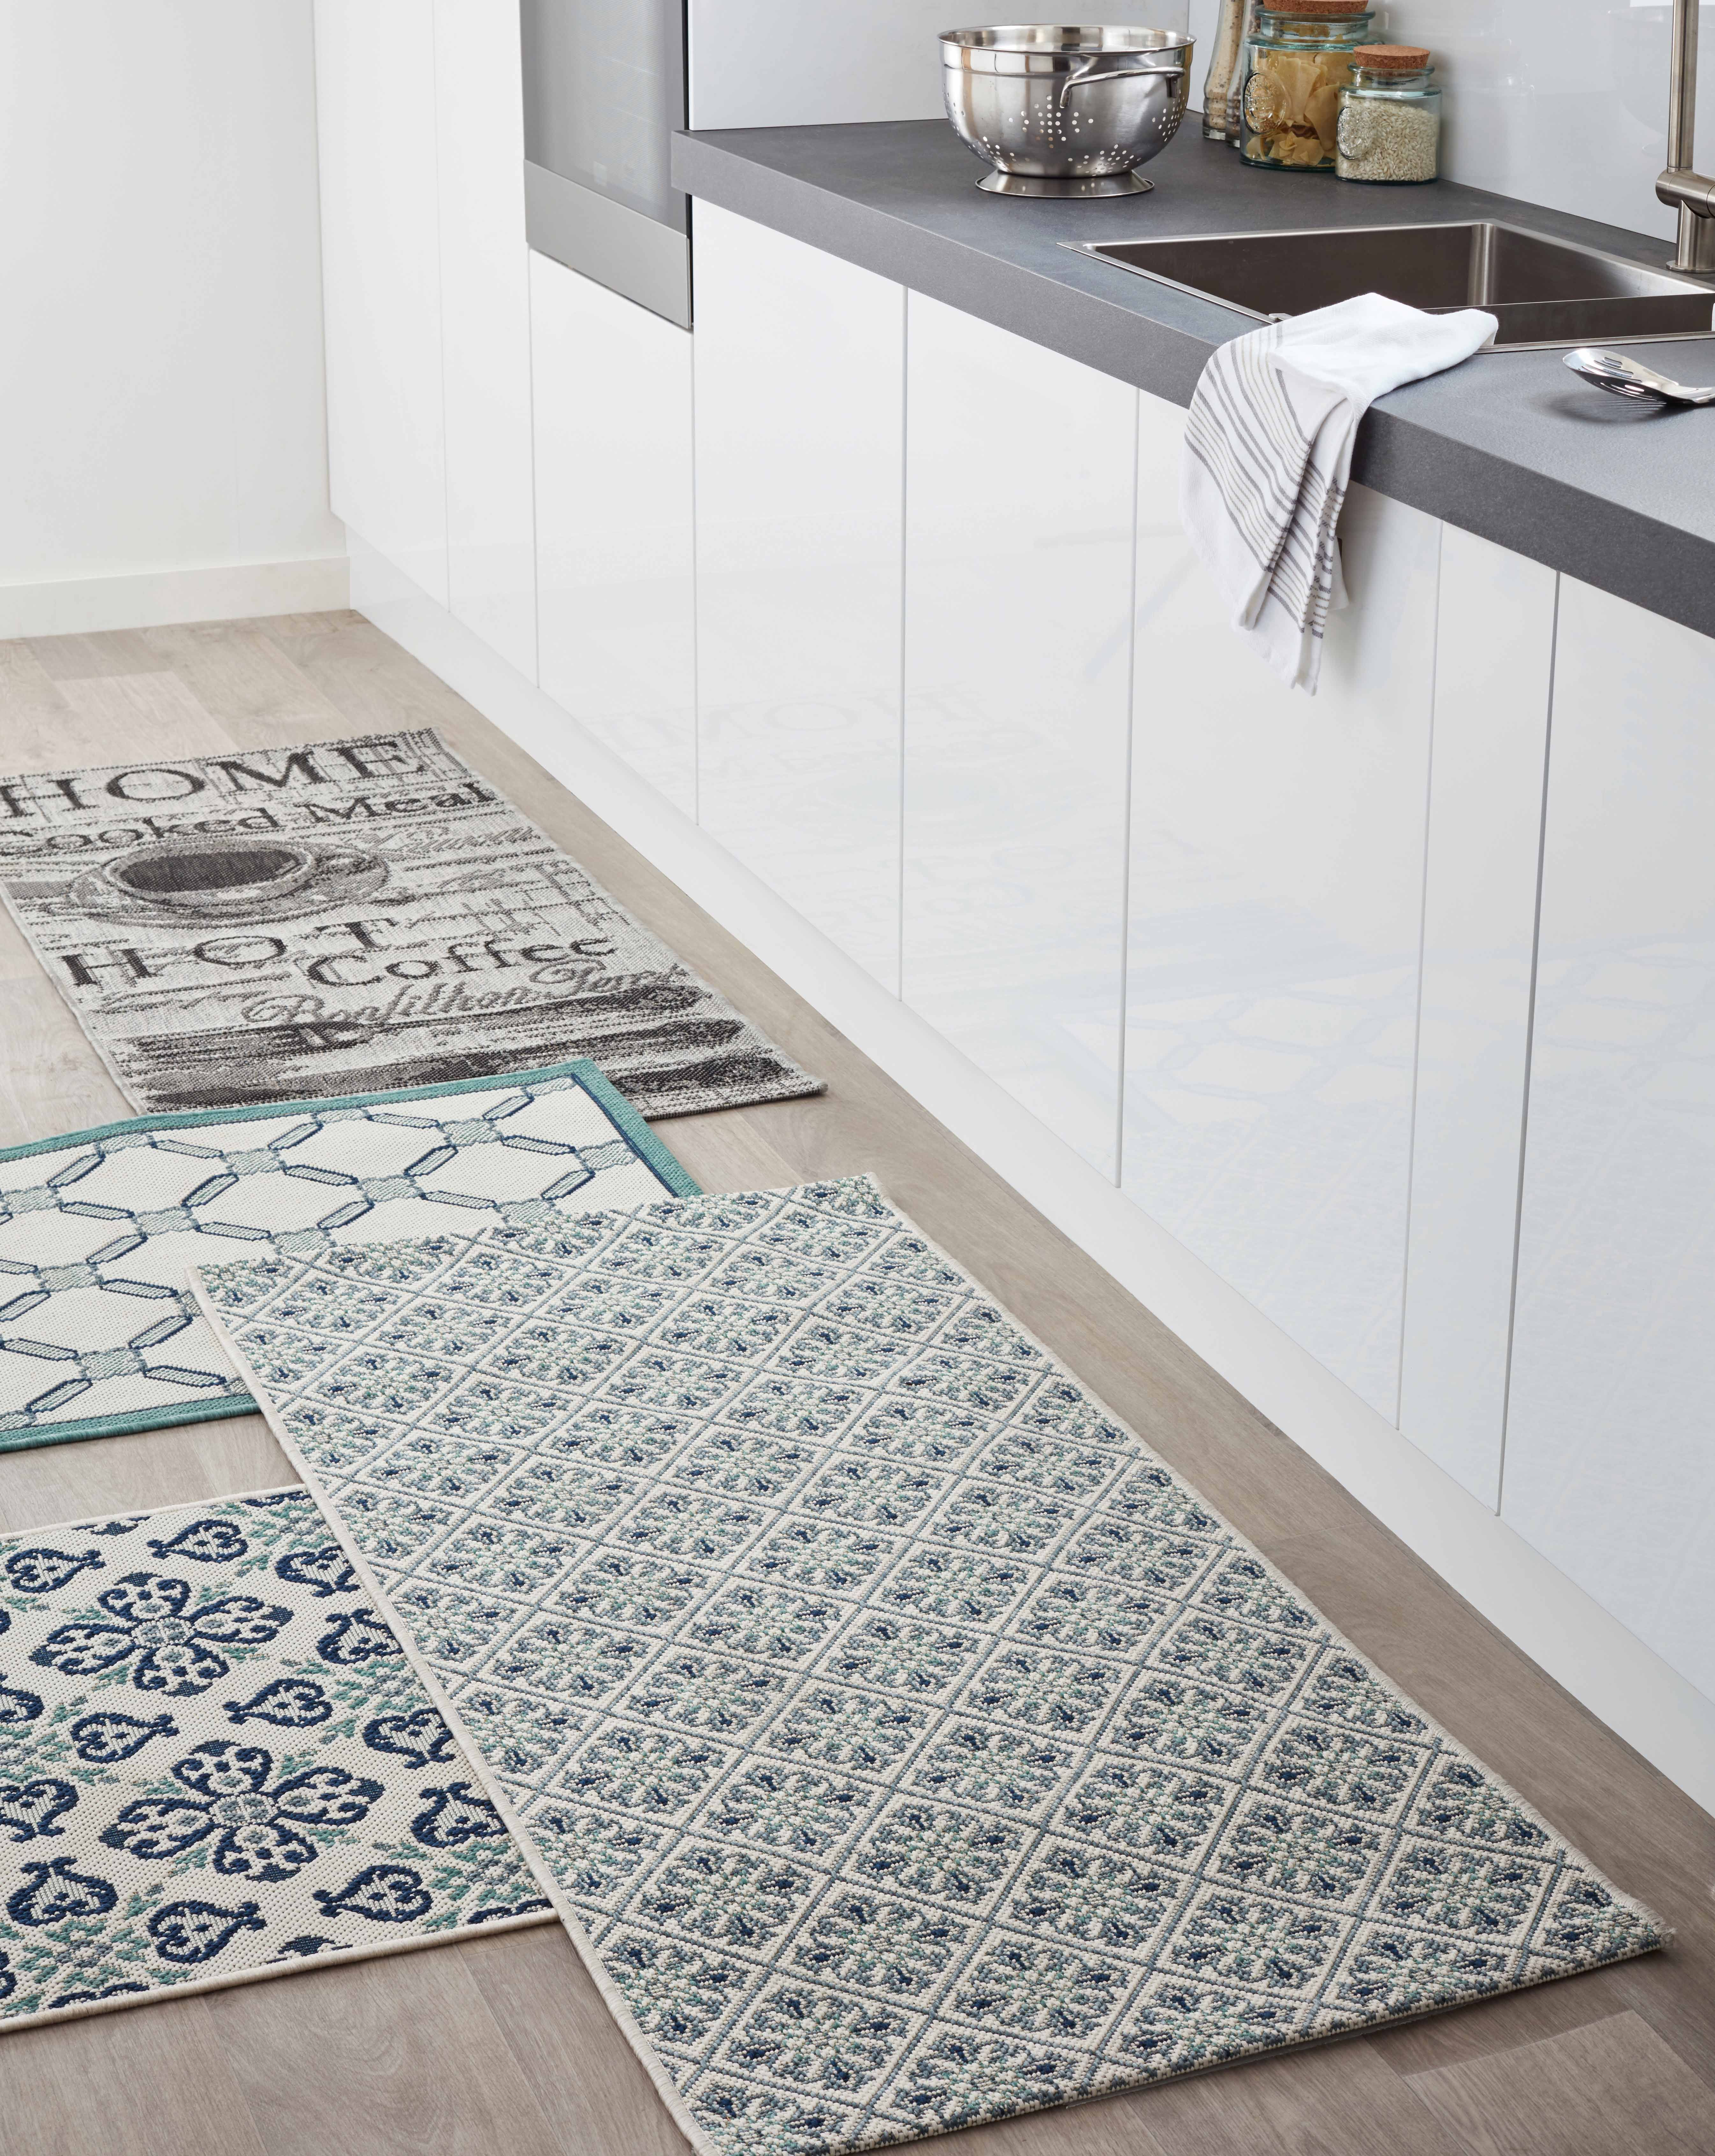 Tapis De Cuisine Decoration Deco Maison Alinea Tapis Cuisine Tapis Lesage Cuisine Moderne